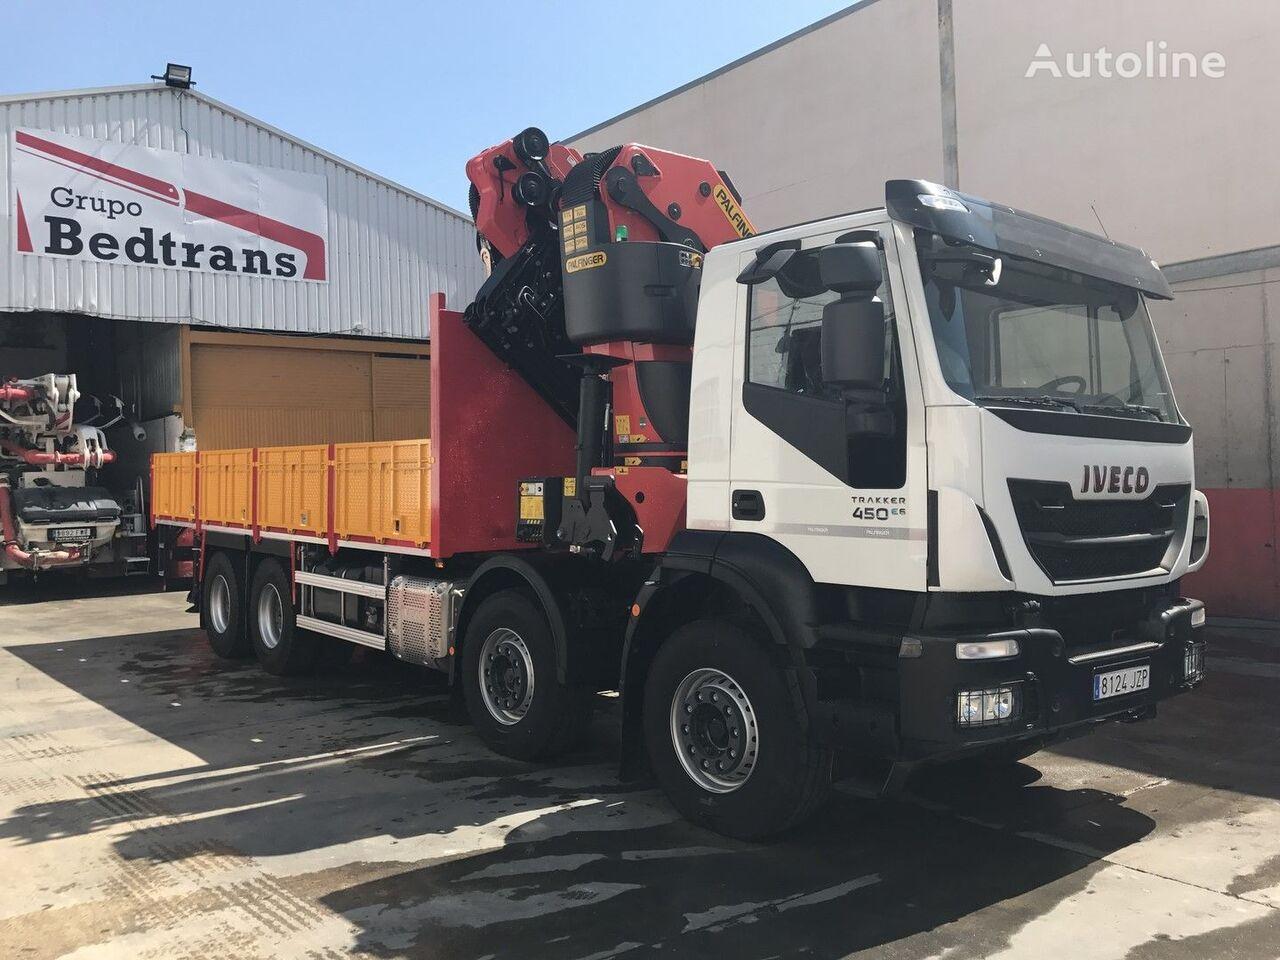 novi IVECO TRAKKER 450 EURO6!!! PALFINGER 78002+JIB NEW!! kamion s ravnom platformom